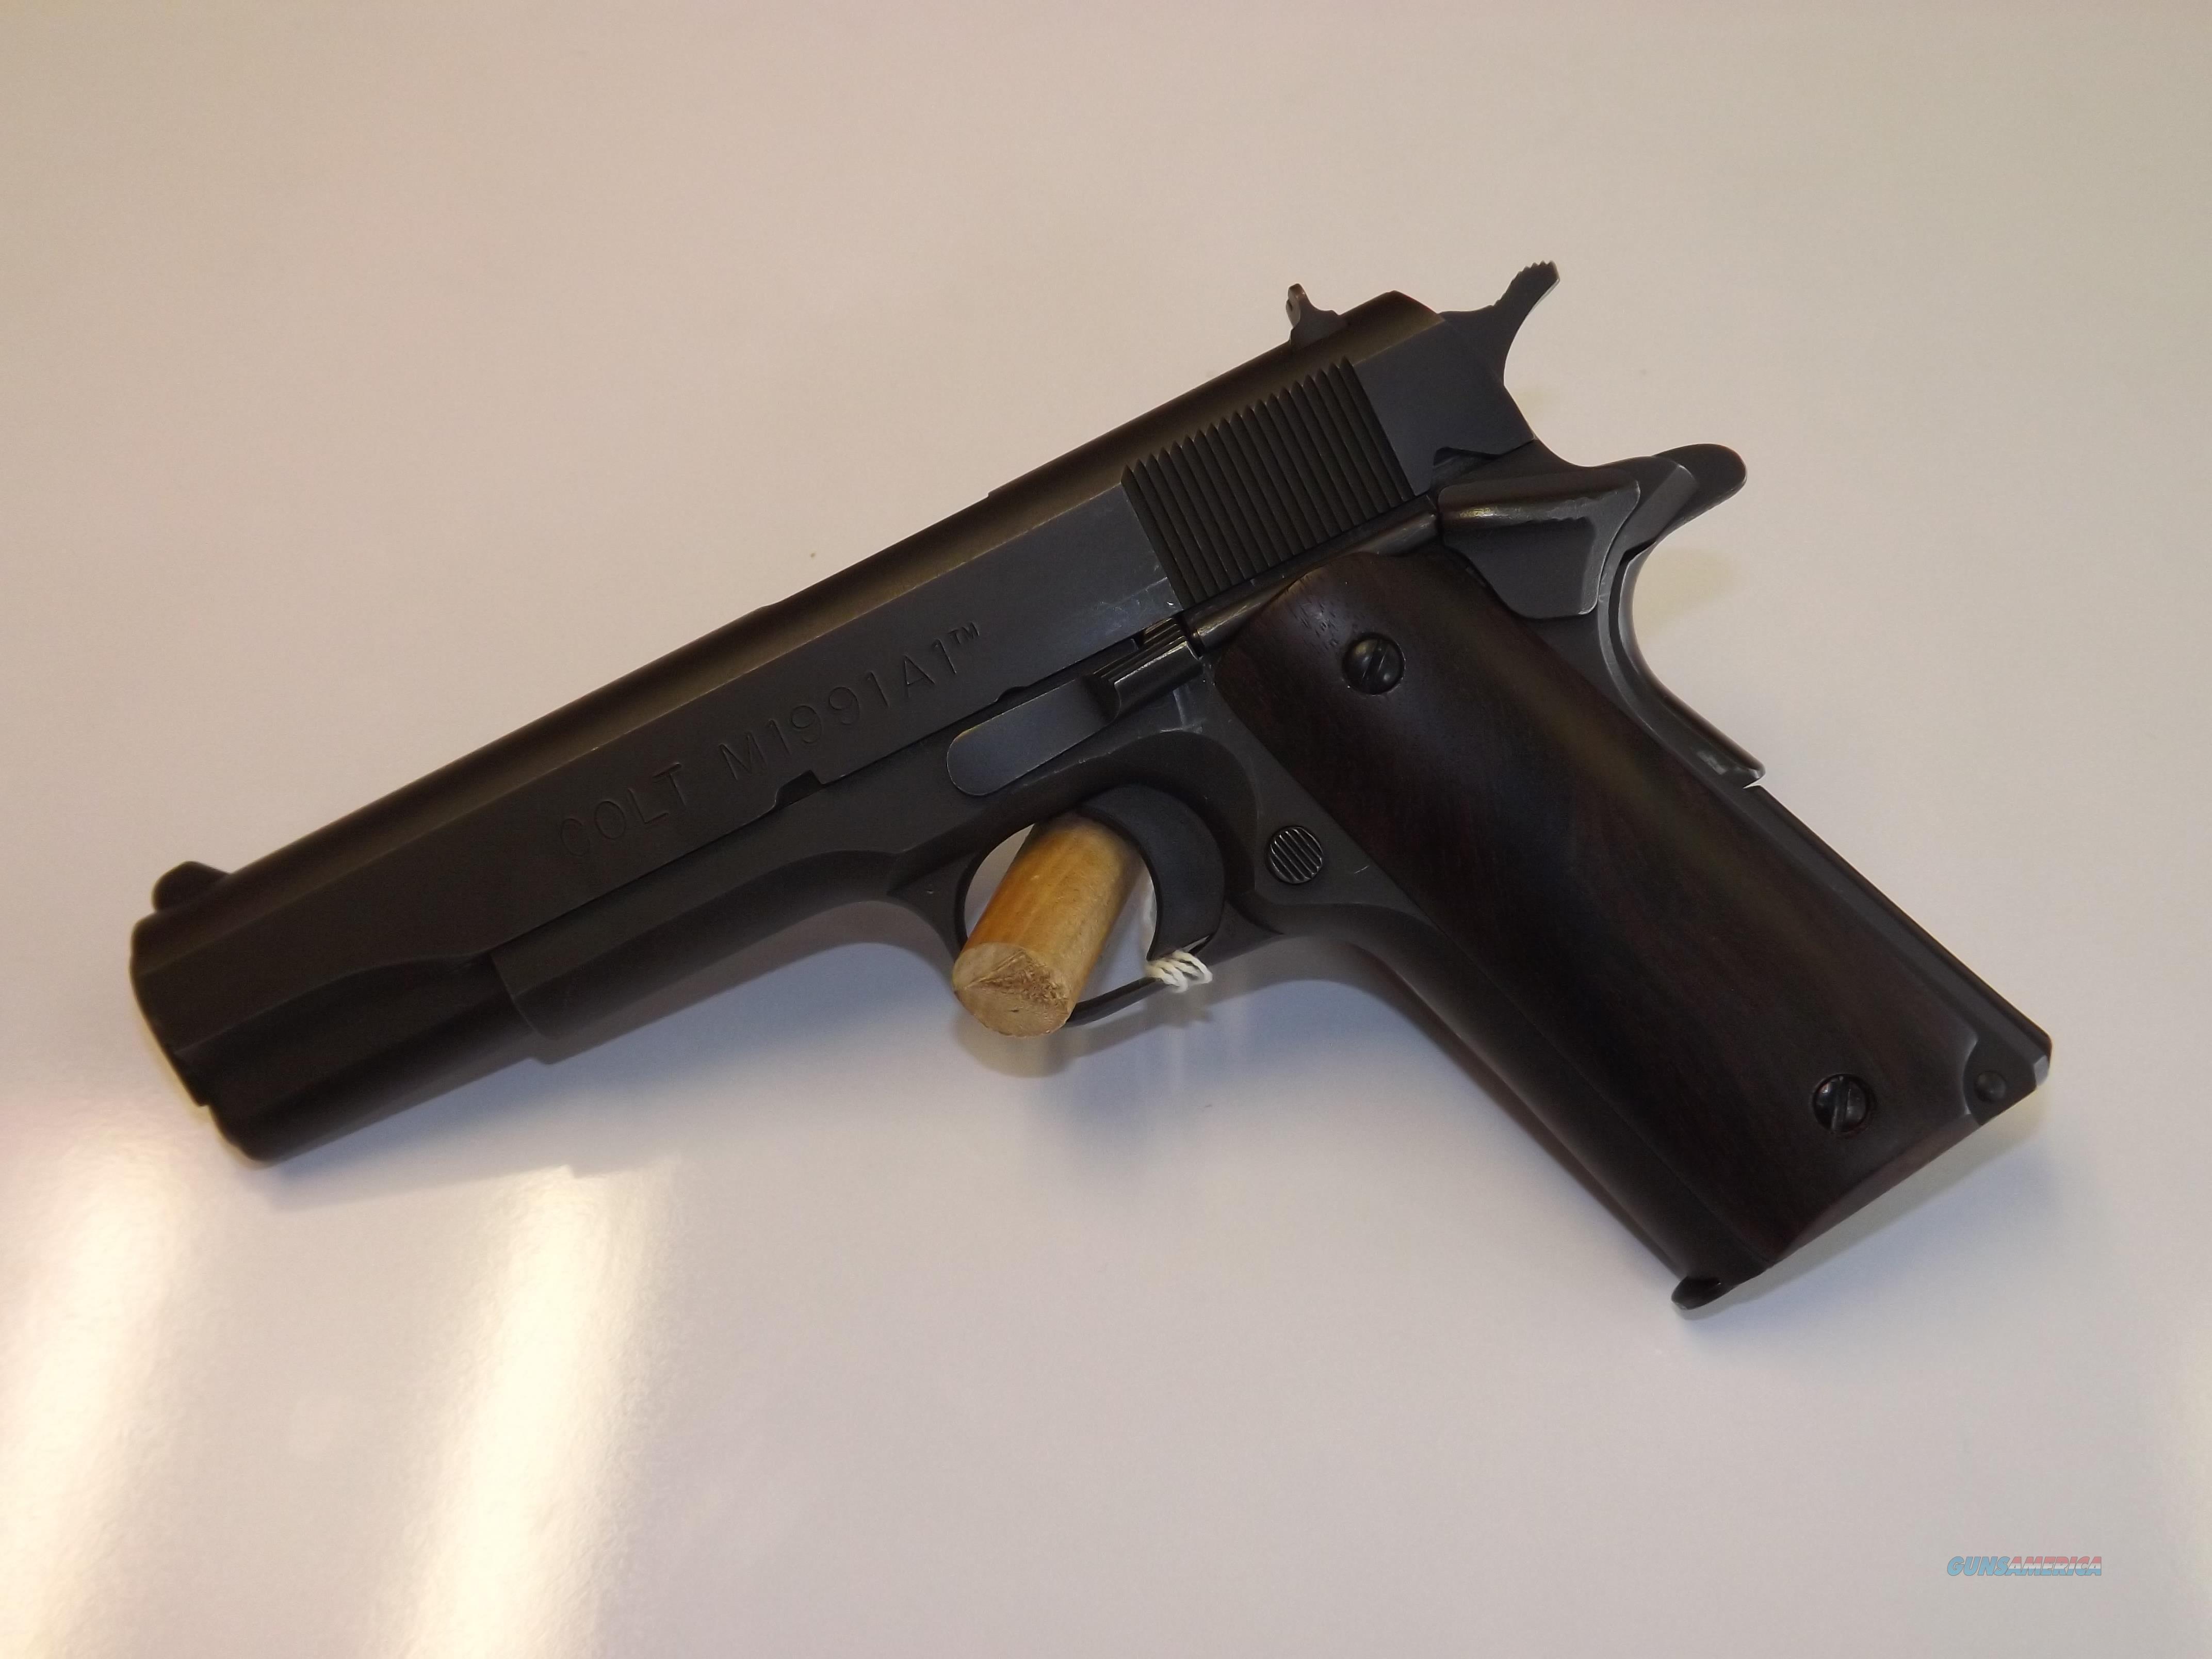 1911A1 Colt 45 ACP  Guns > Pistols > 1911 Pistol Copies (non-Colt)